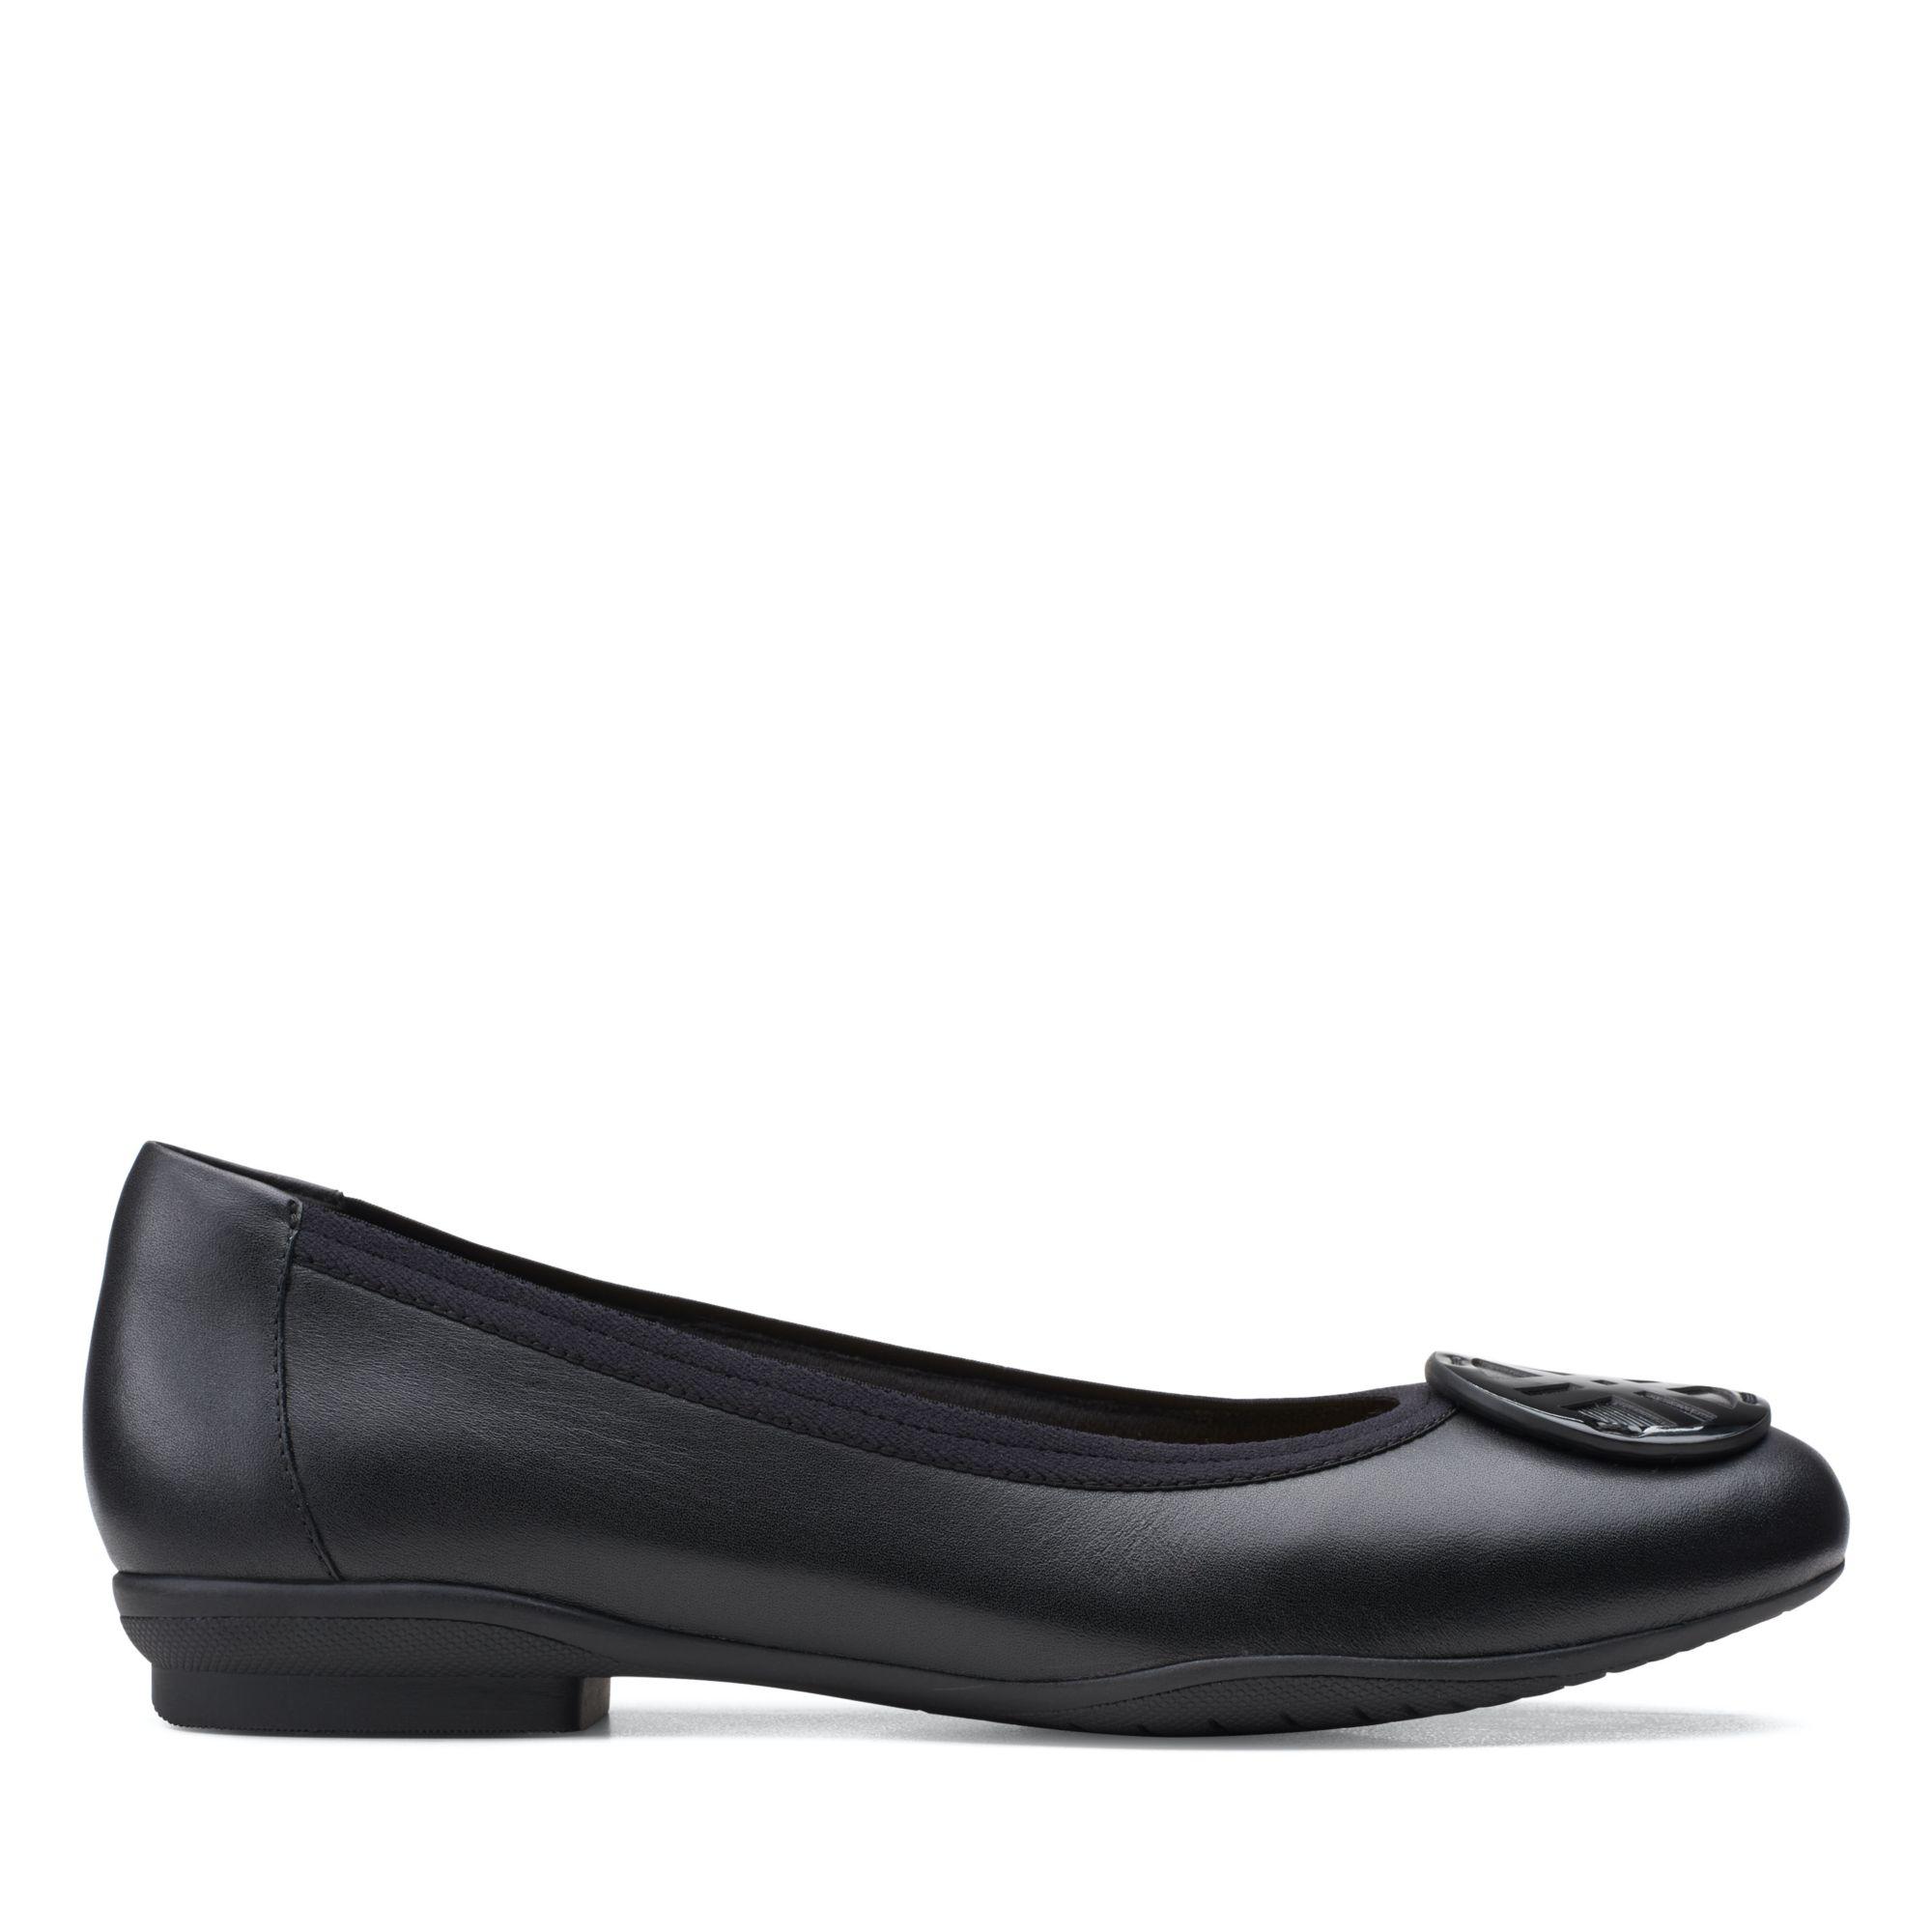 Clarks摩登經典-Sara Willow經典款芭蕾平底鞋(黑)